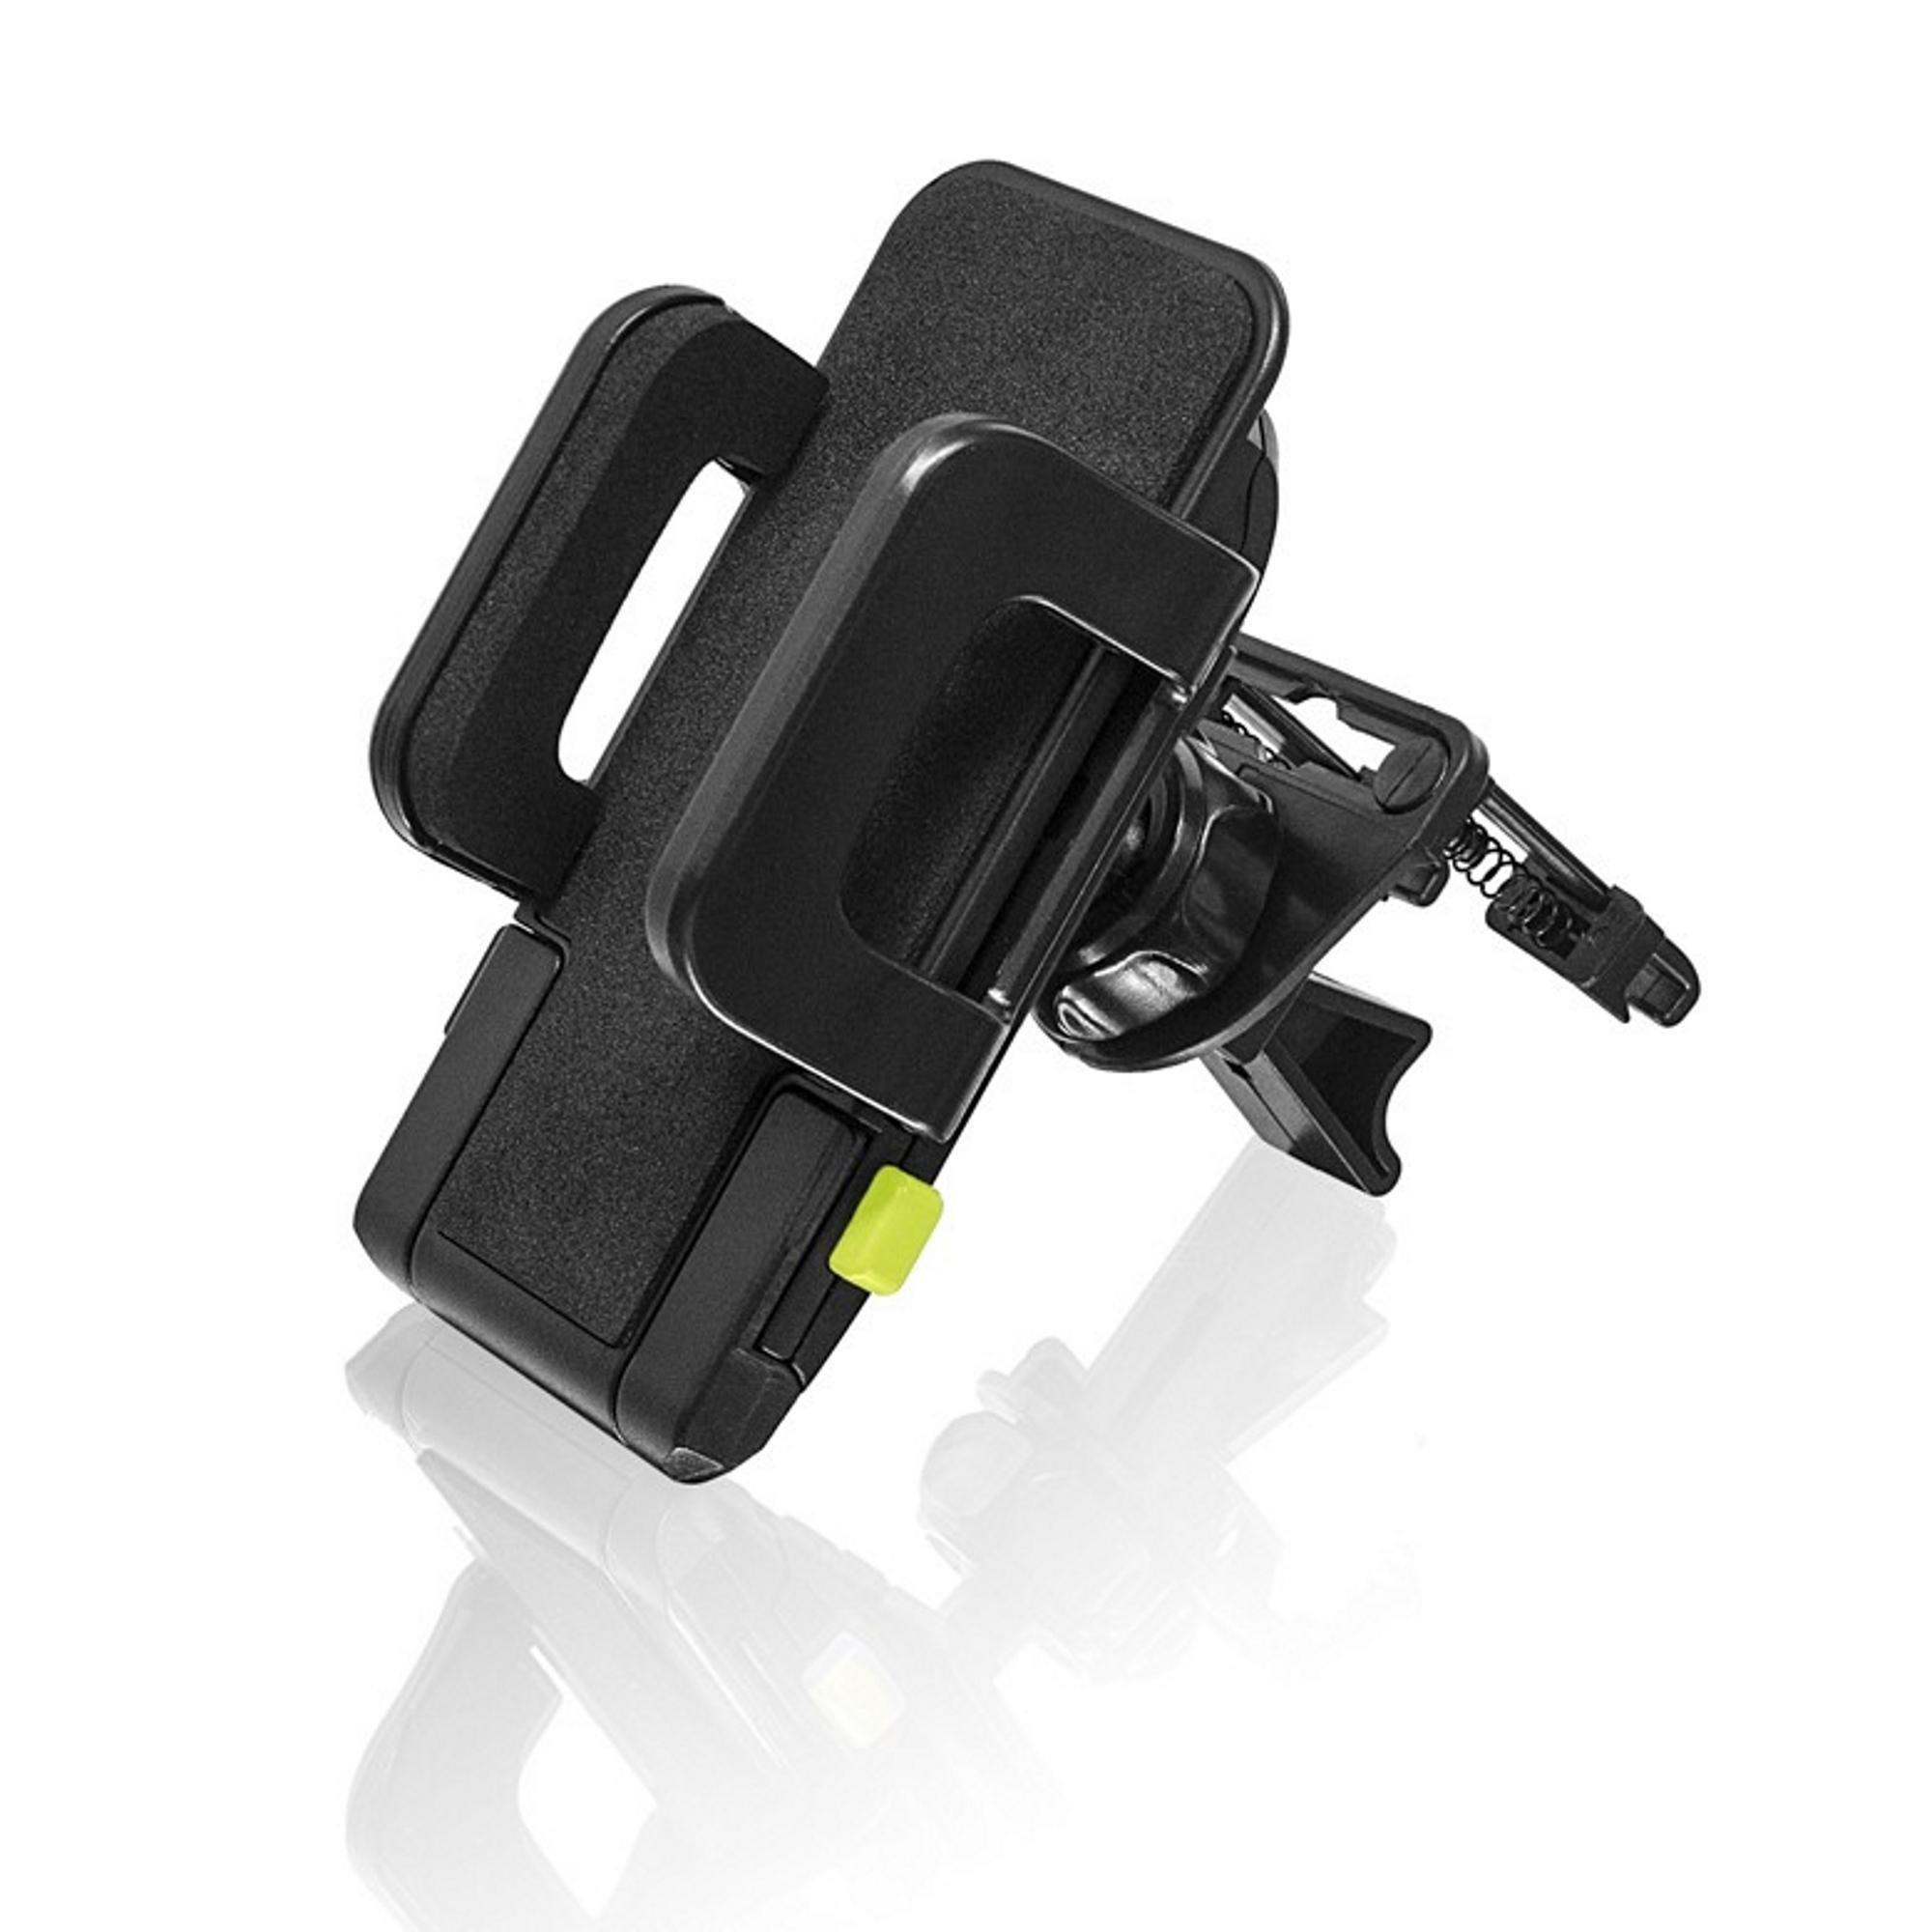 Bracketron The TekGrip Vent Car Mount for Unioversal - Black